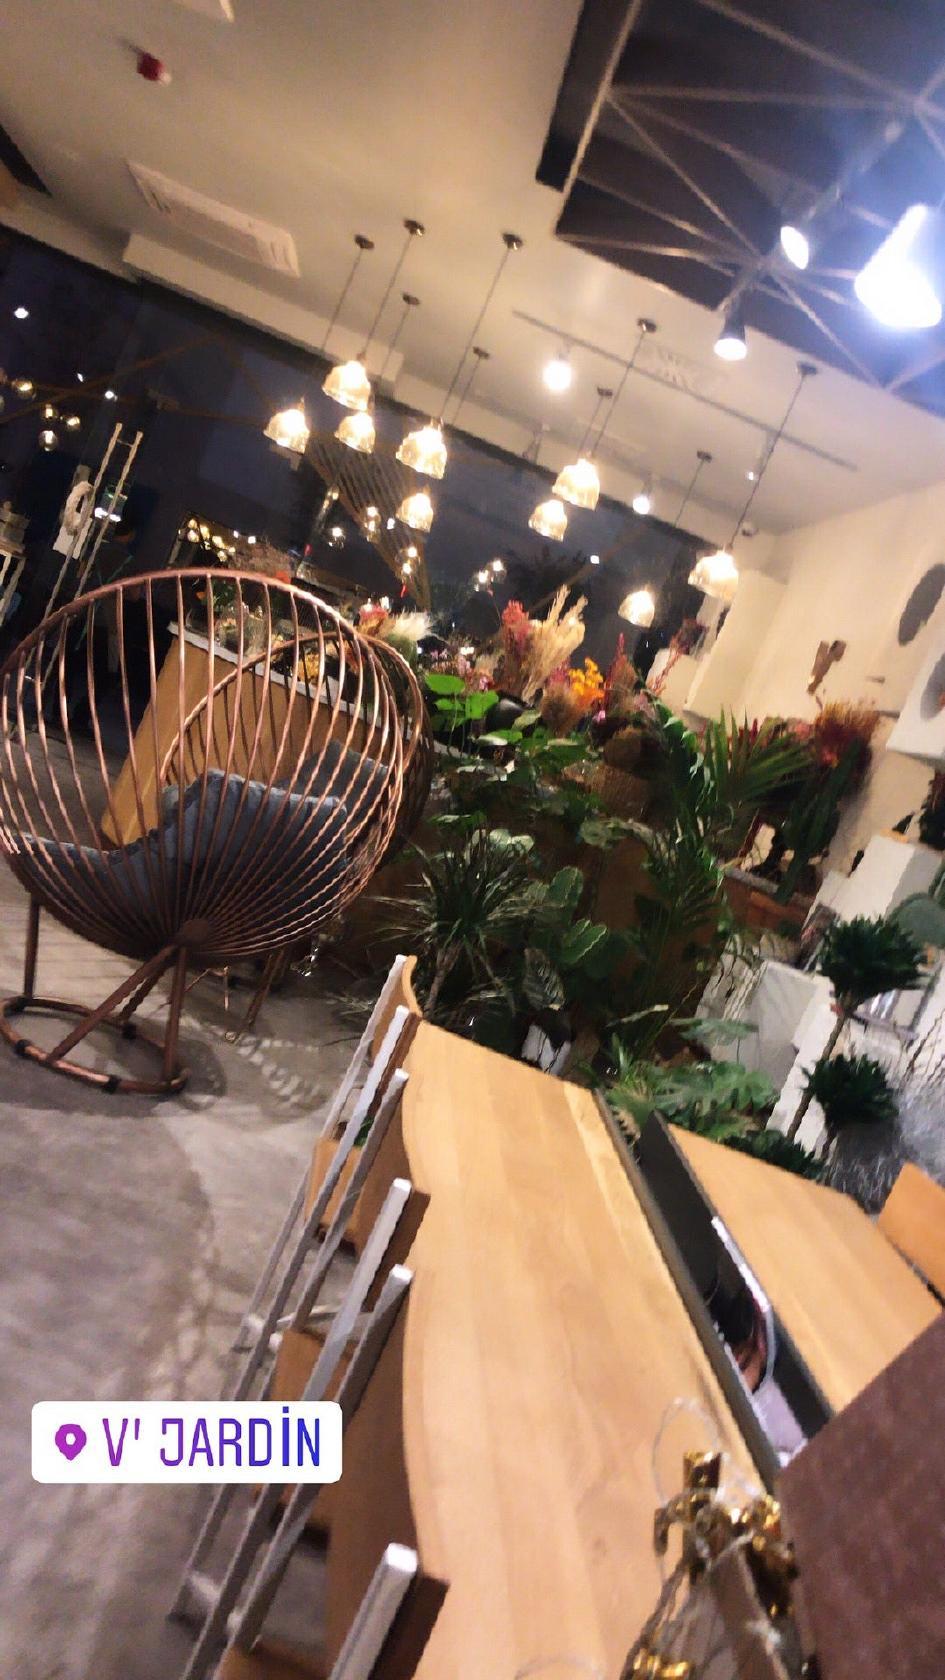 V Jardin Ankara, Ankara - Restaurant Reviews pour Transate Jardin